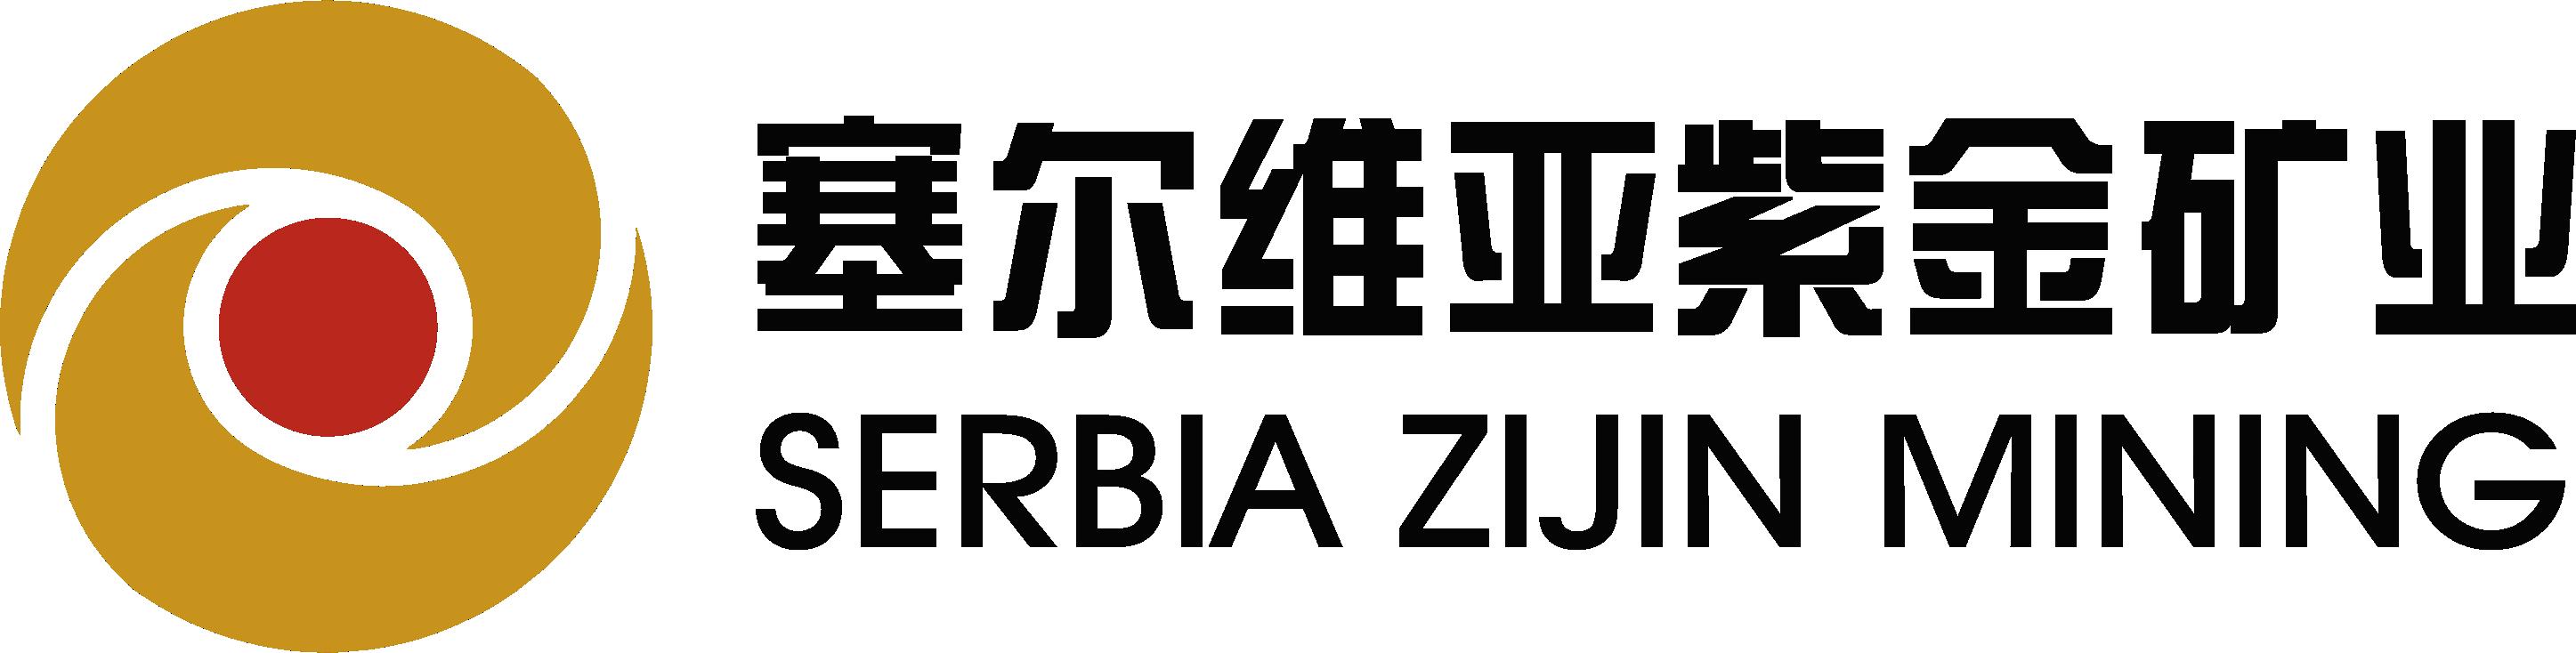 Serbia Zijin Mining d.o.o. Bor